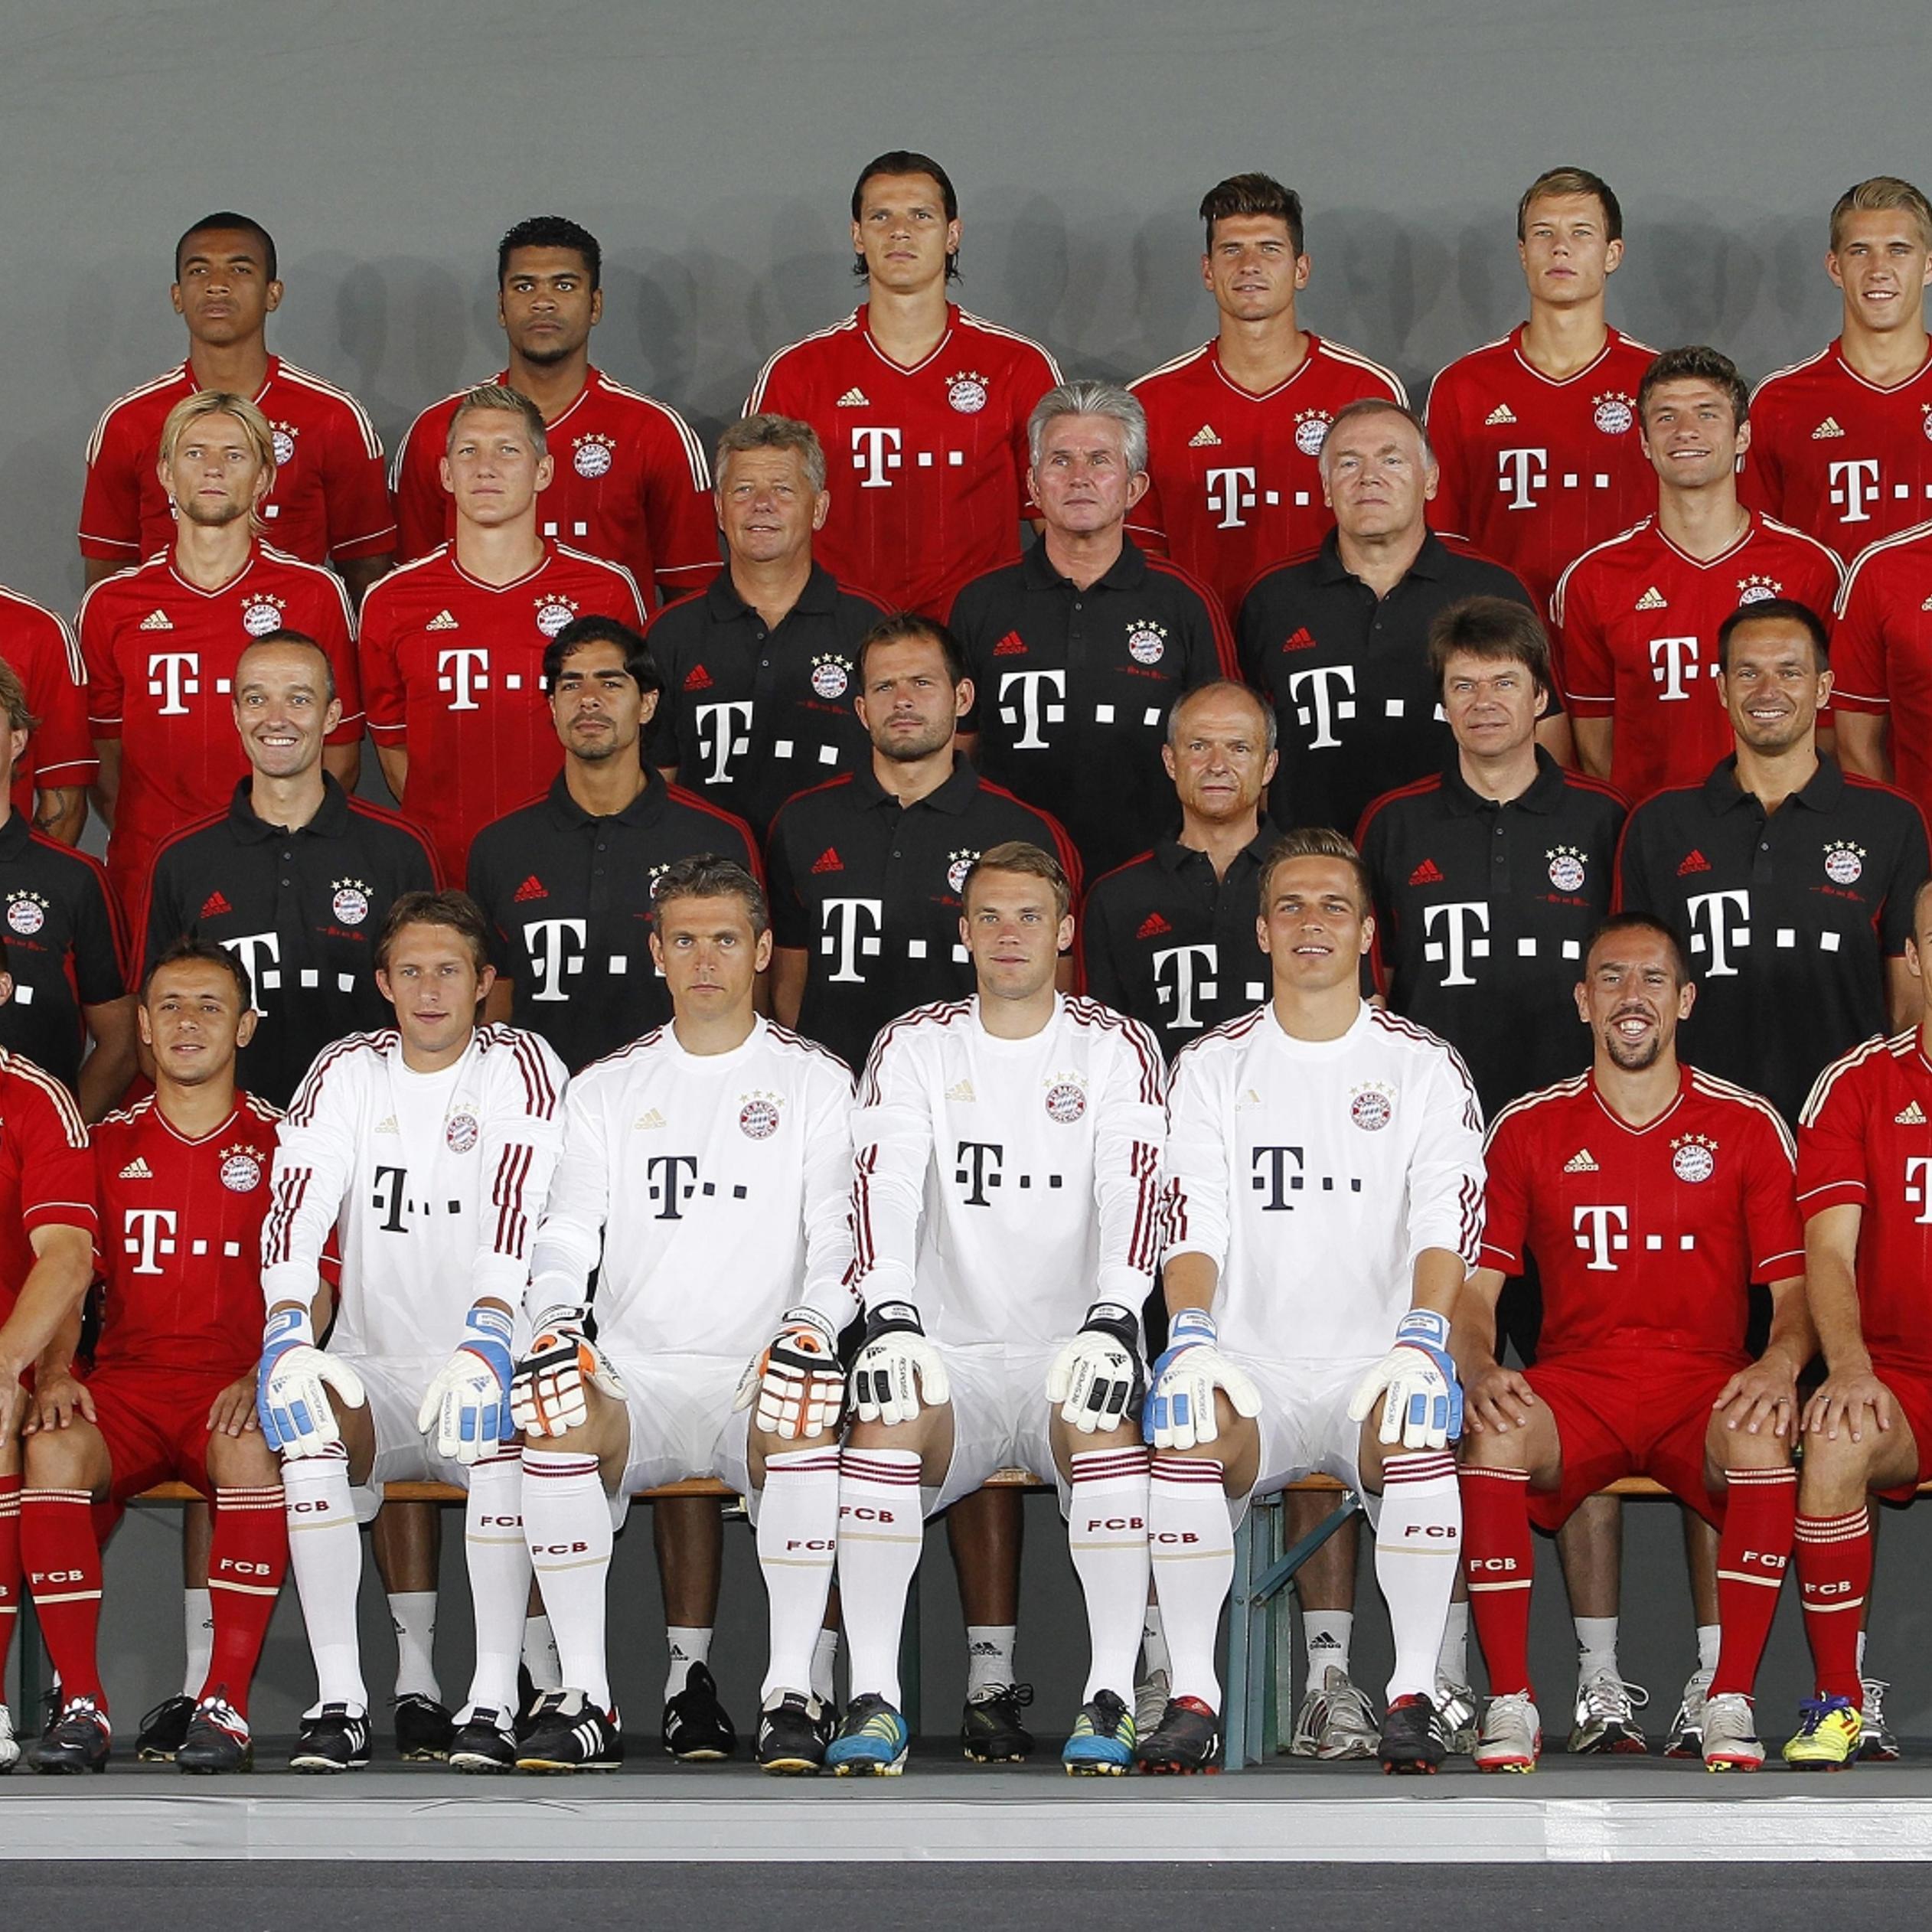 Players of fc bayern munchen team wallpaper download 2524x2524 voltagebd Images